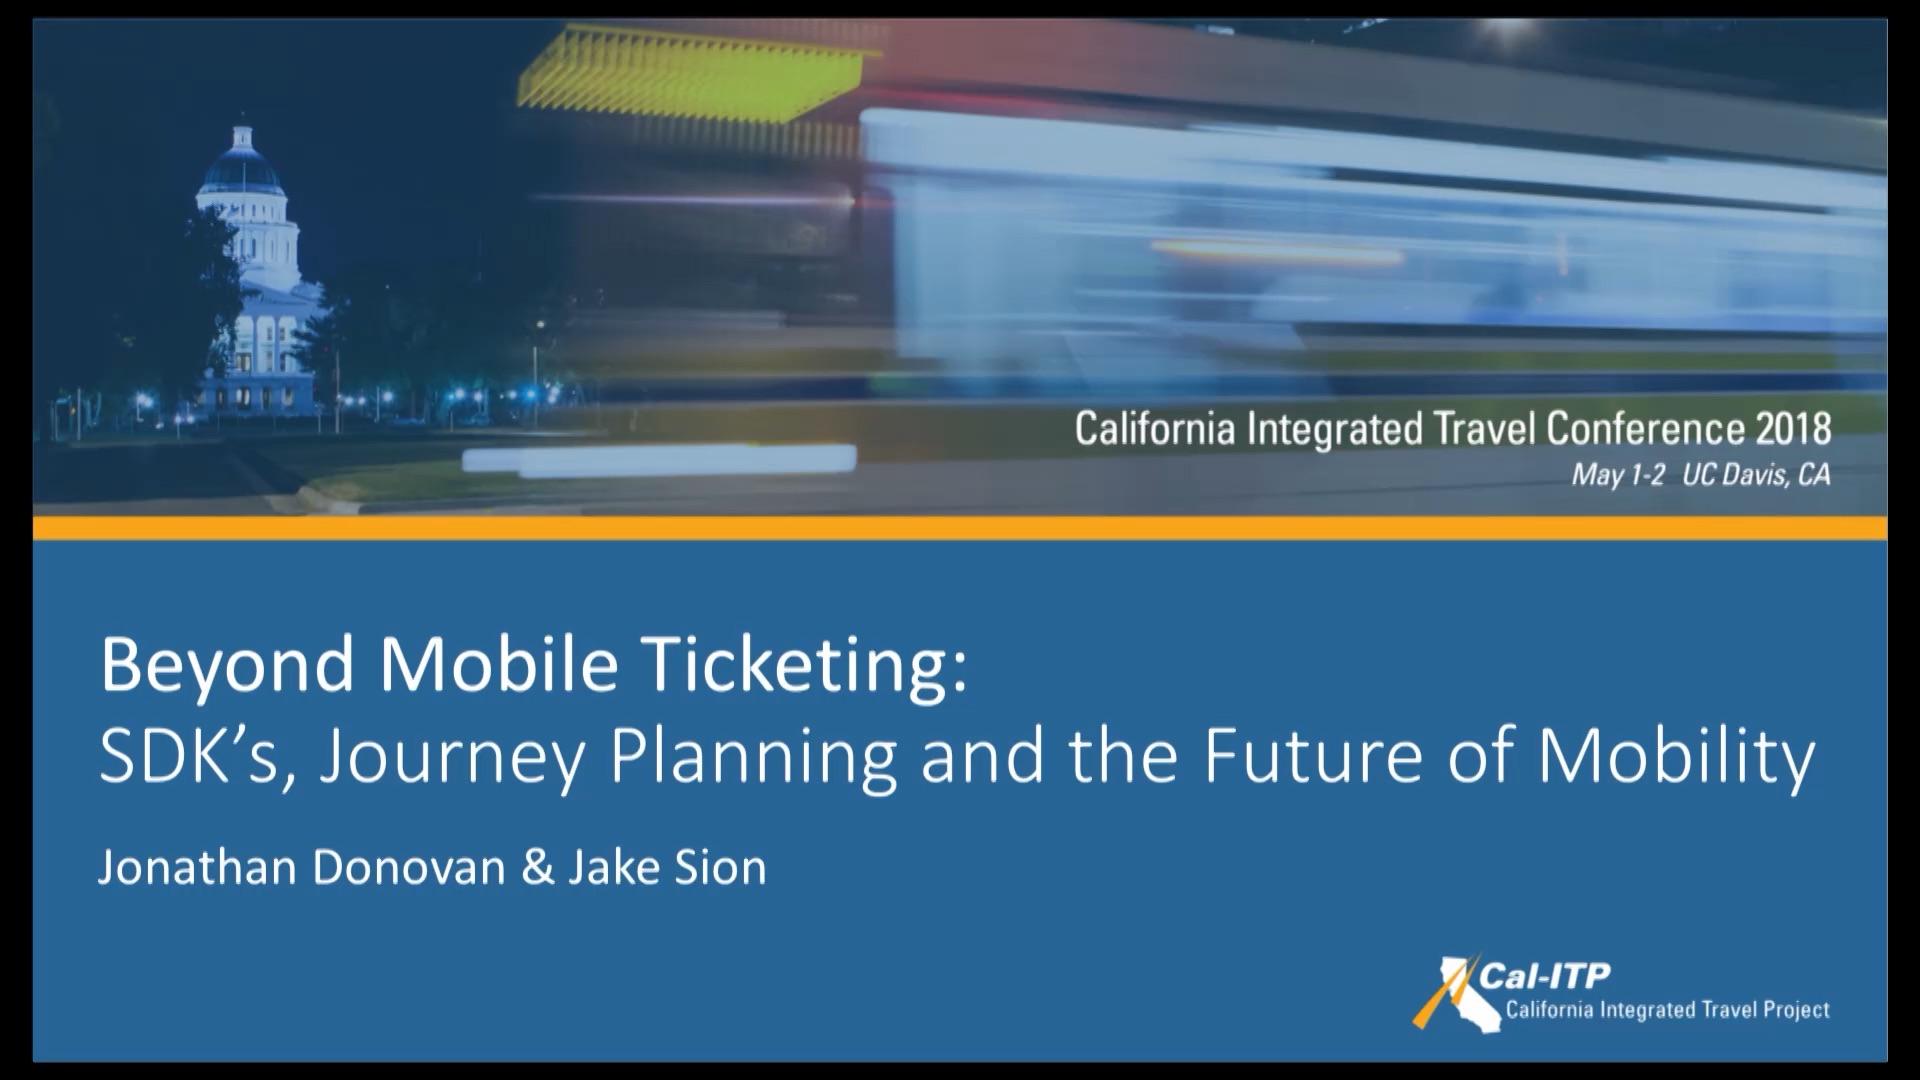 25. Beyond Mobile Ticketing